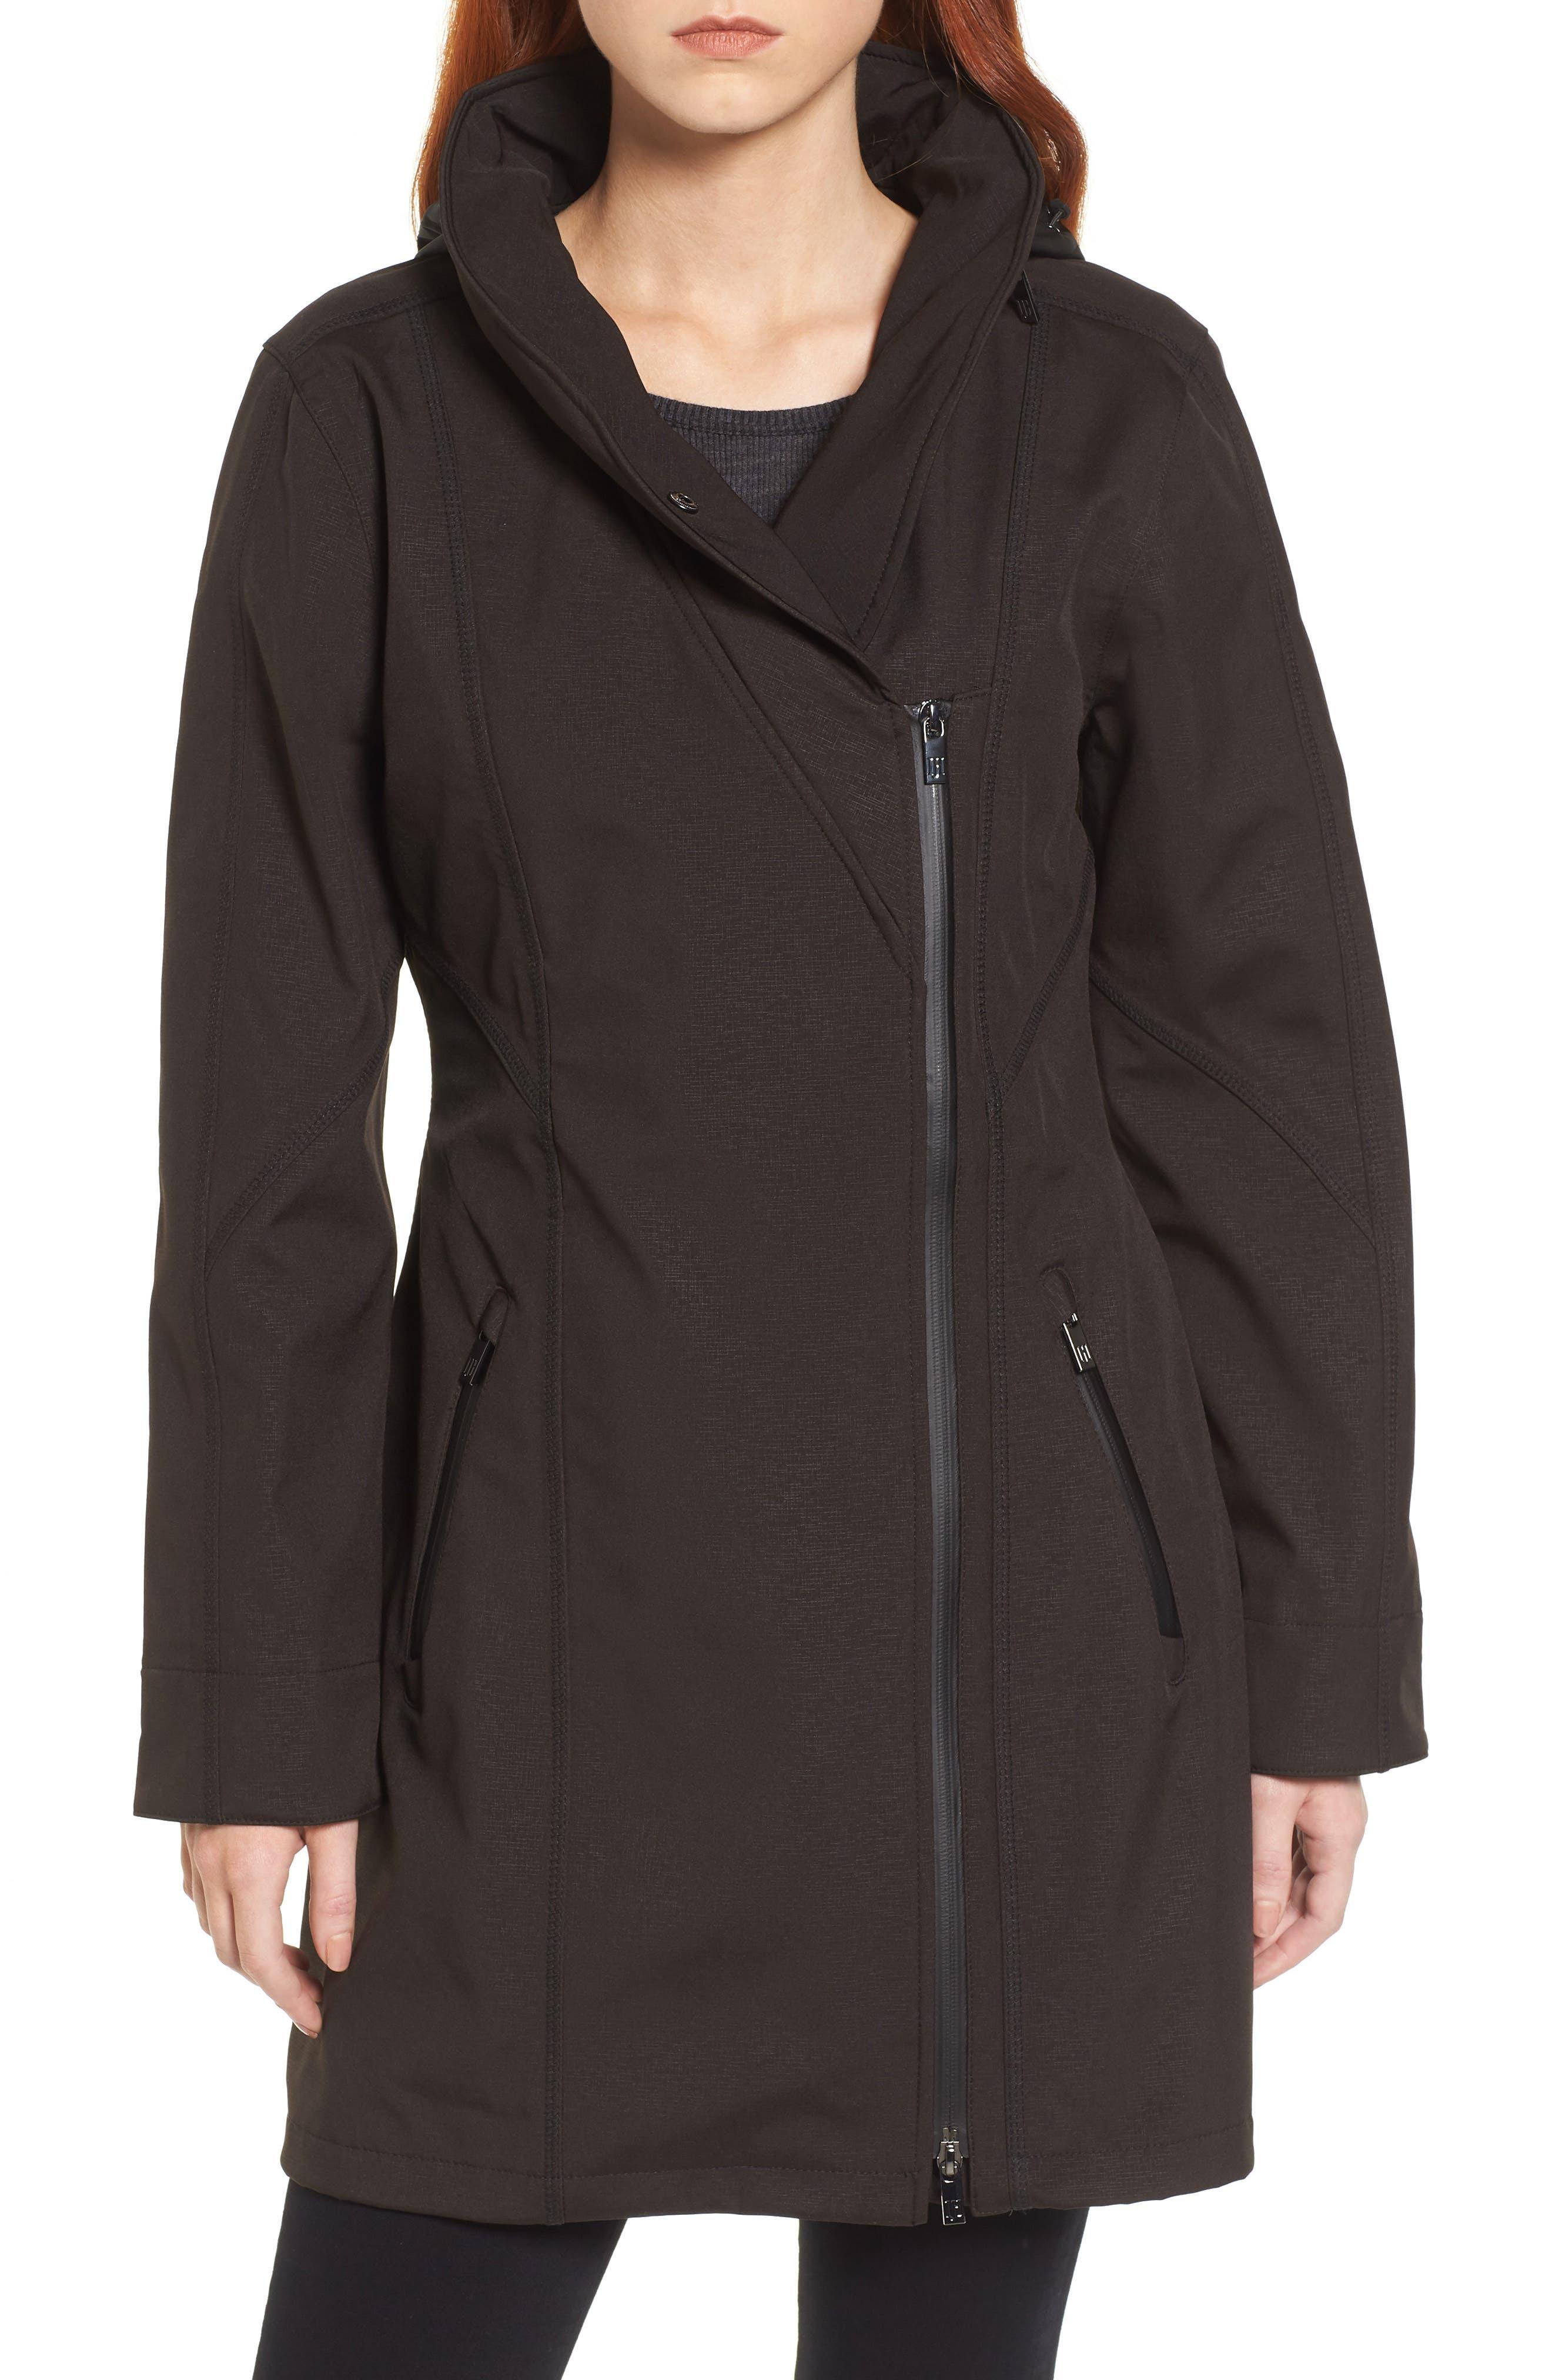 Hornbaek Soft Shell Raincoat,                             Main thumbnail 1, color,                             Black